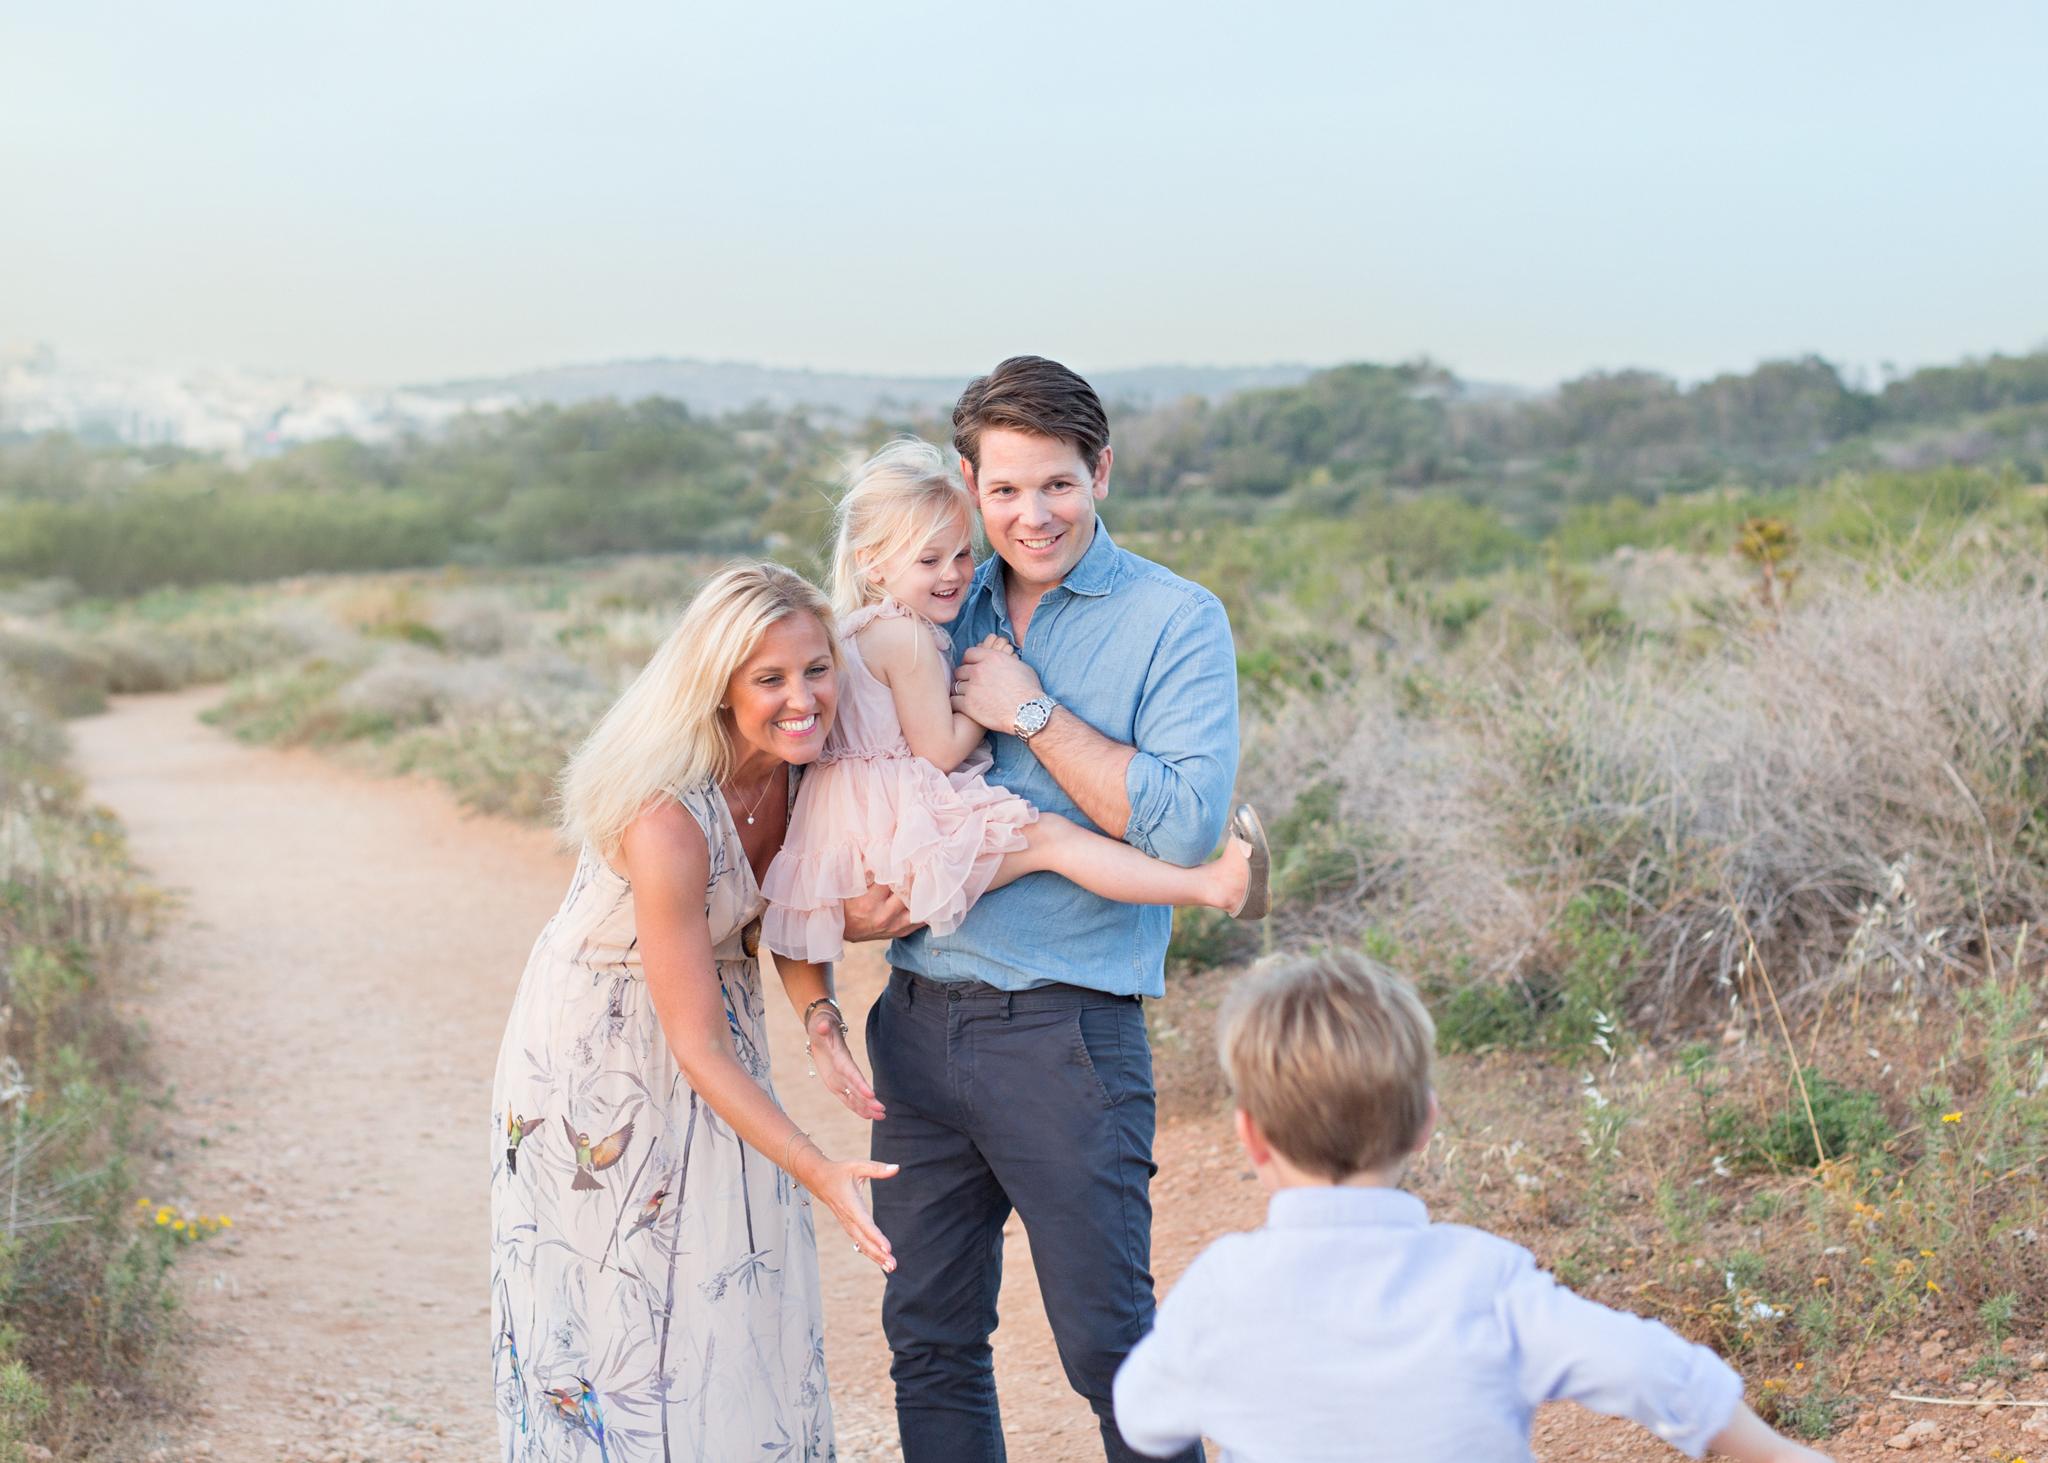 Golden bay malta, family photoshoot malta, mother and son photo, playful, connection, sea, sunset, family photography malta